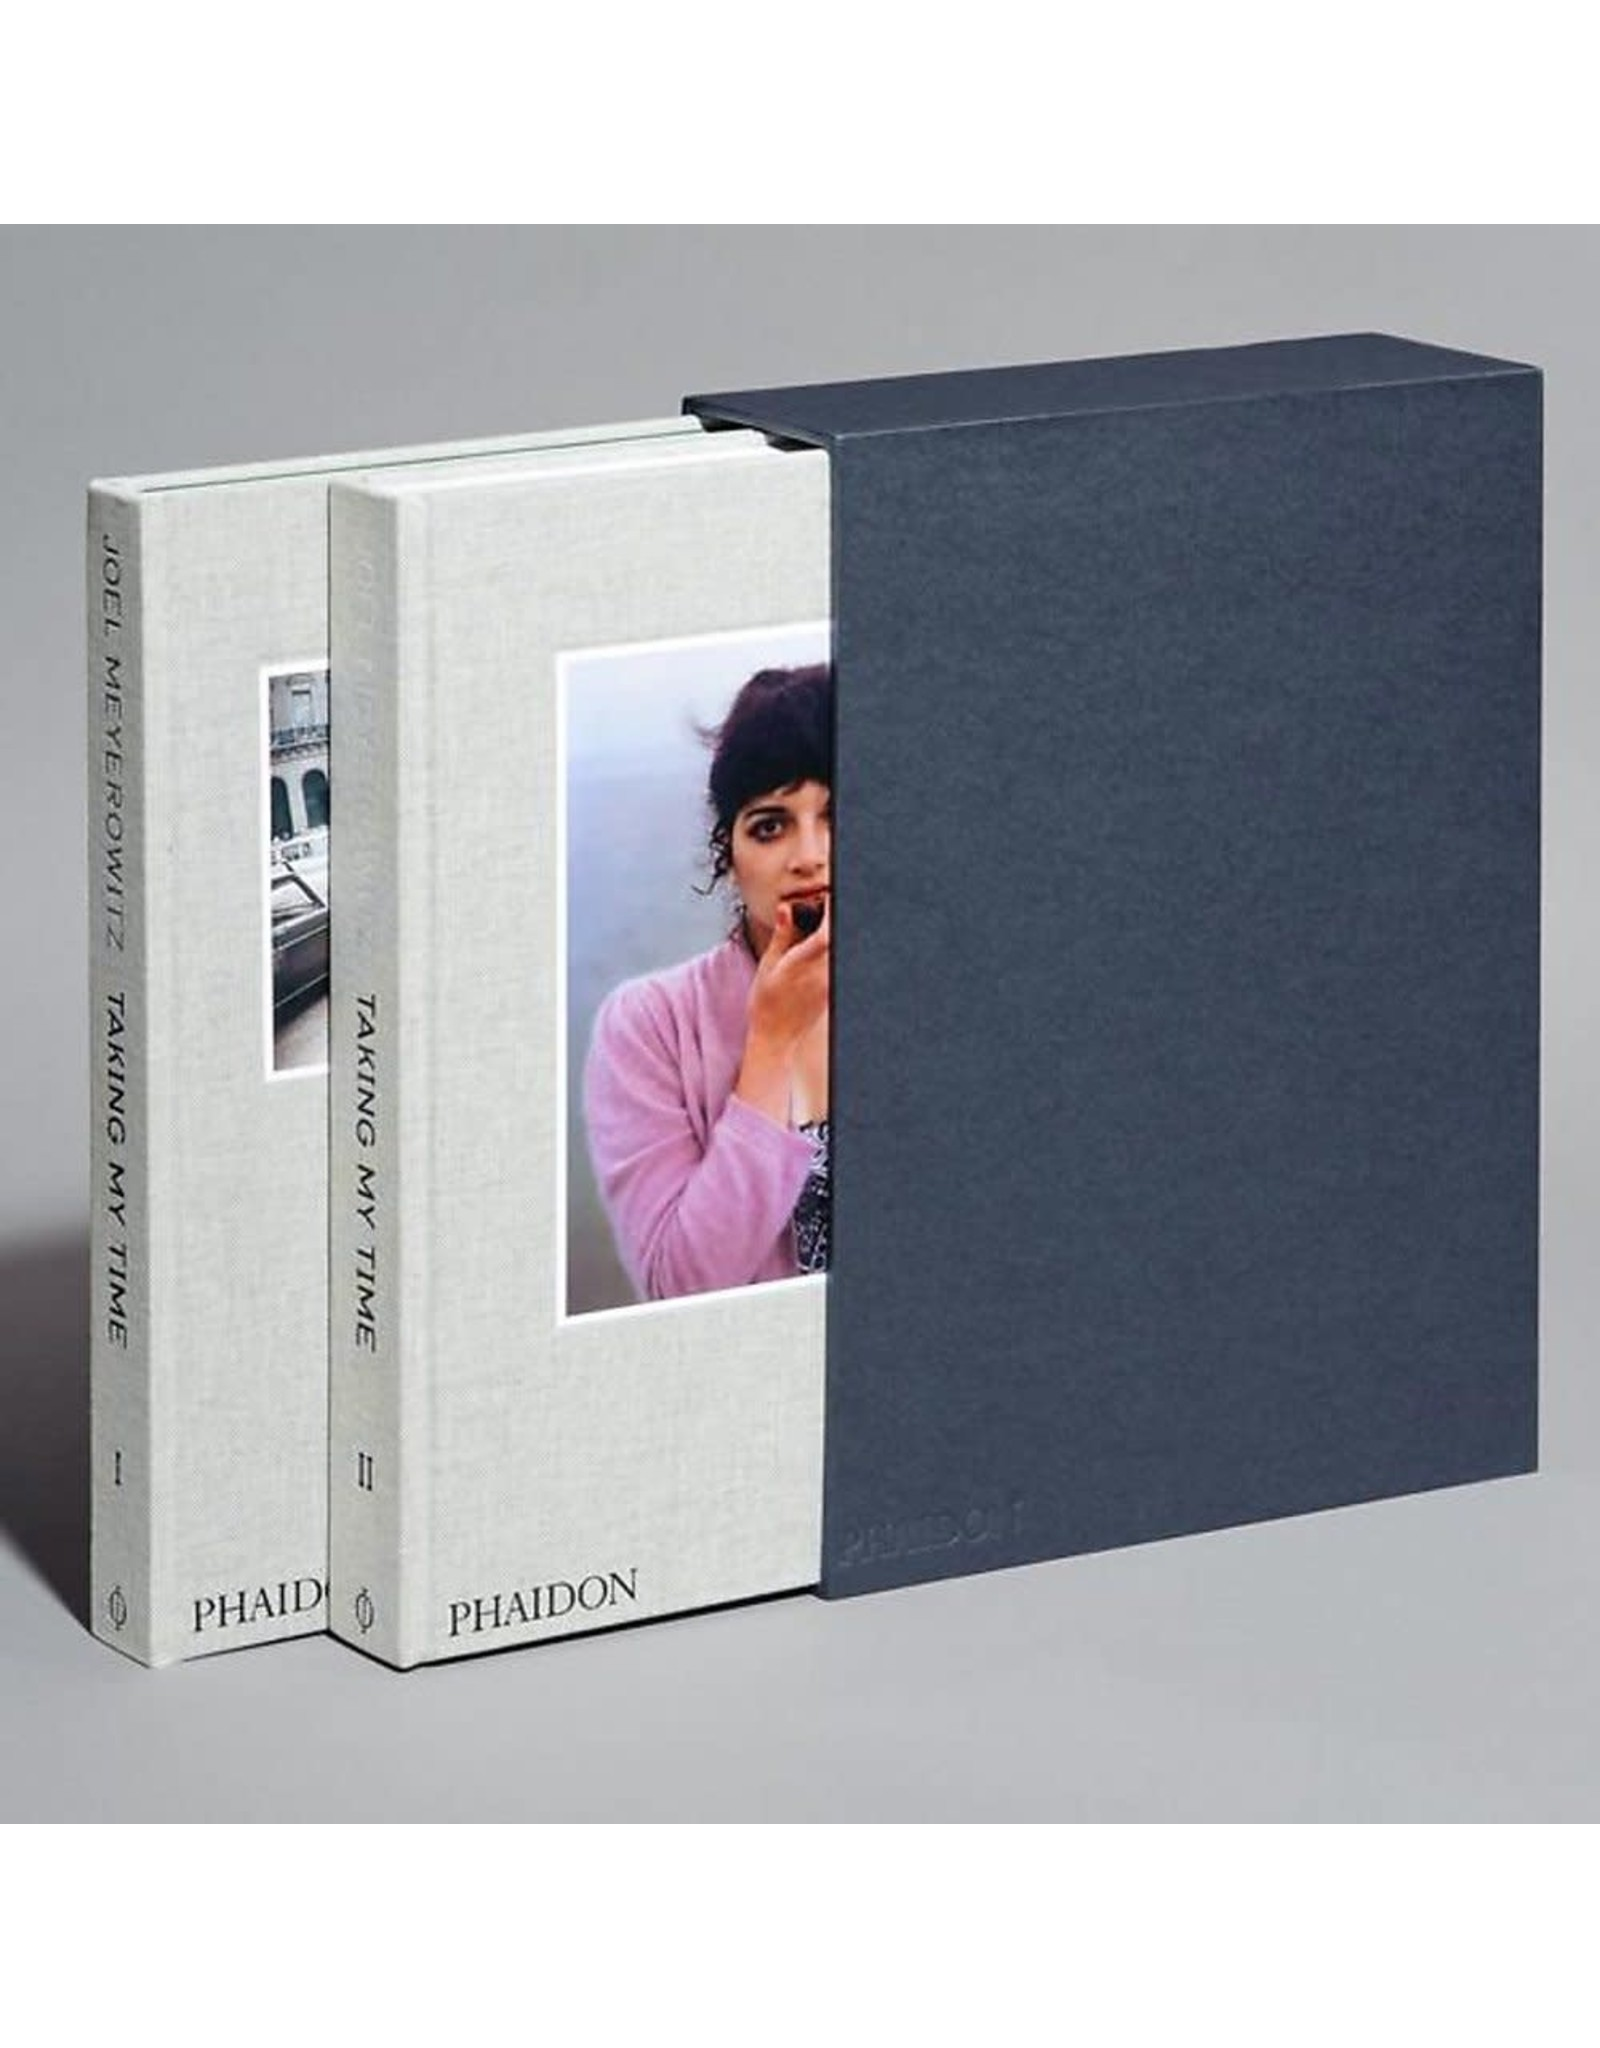 Joel Meyerowitz: Taking My Time, Limited Edition